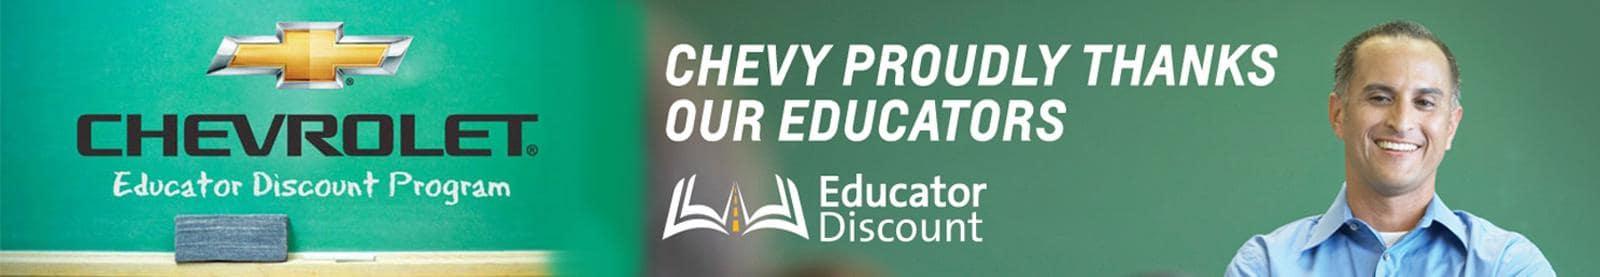 Educator Discount banner